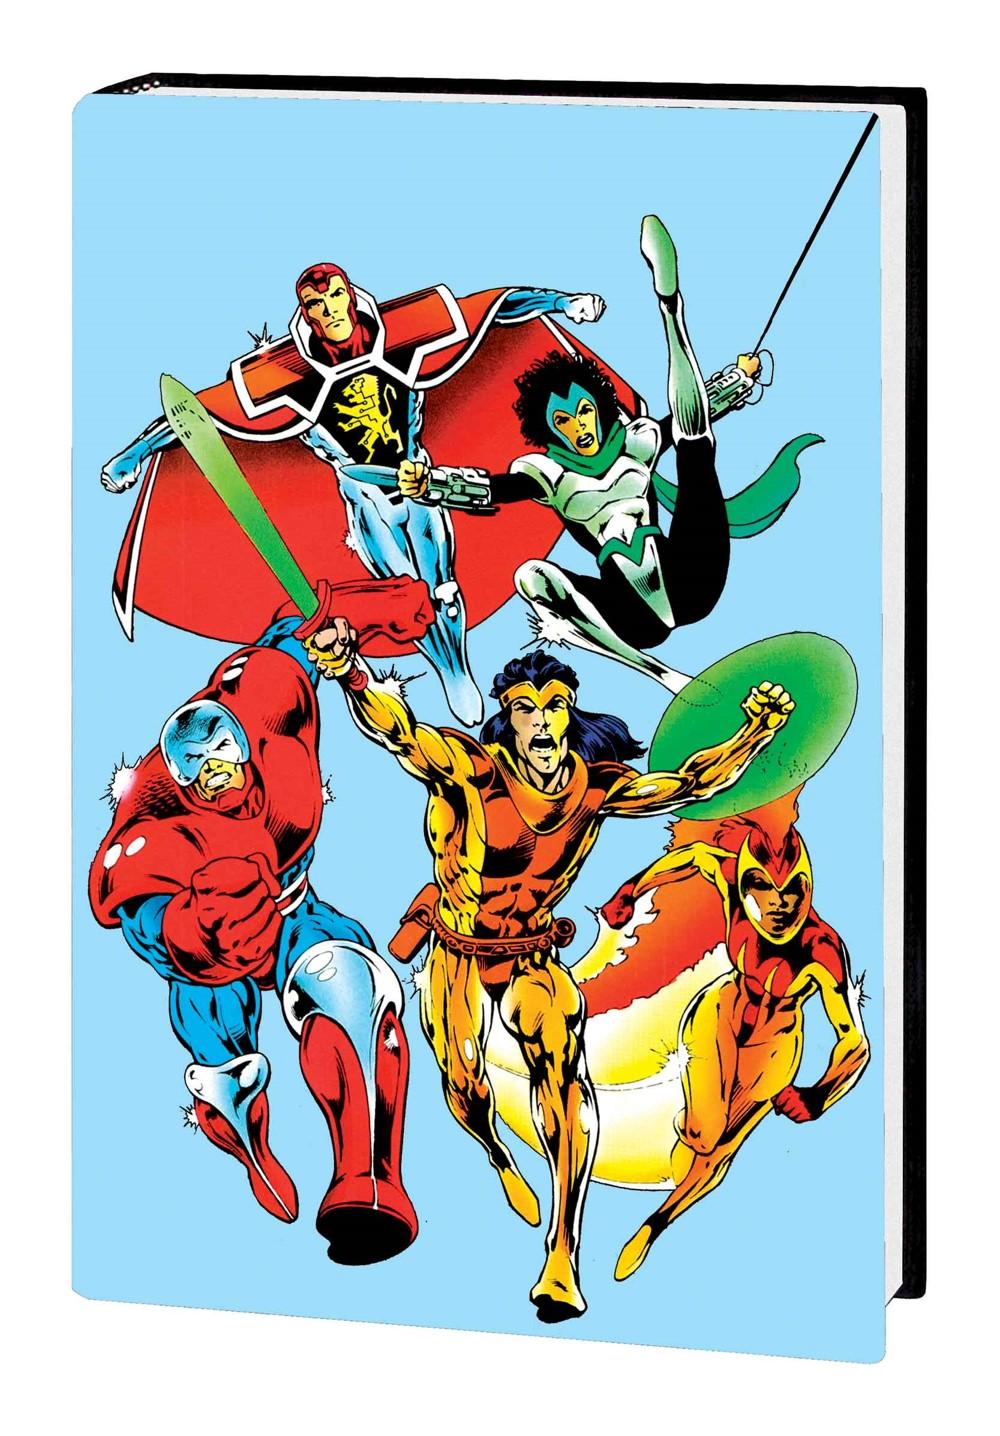 KOPOMNIHC_COV1_VAR Marvel Comics October 2021 Solicitations